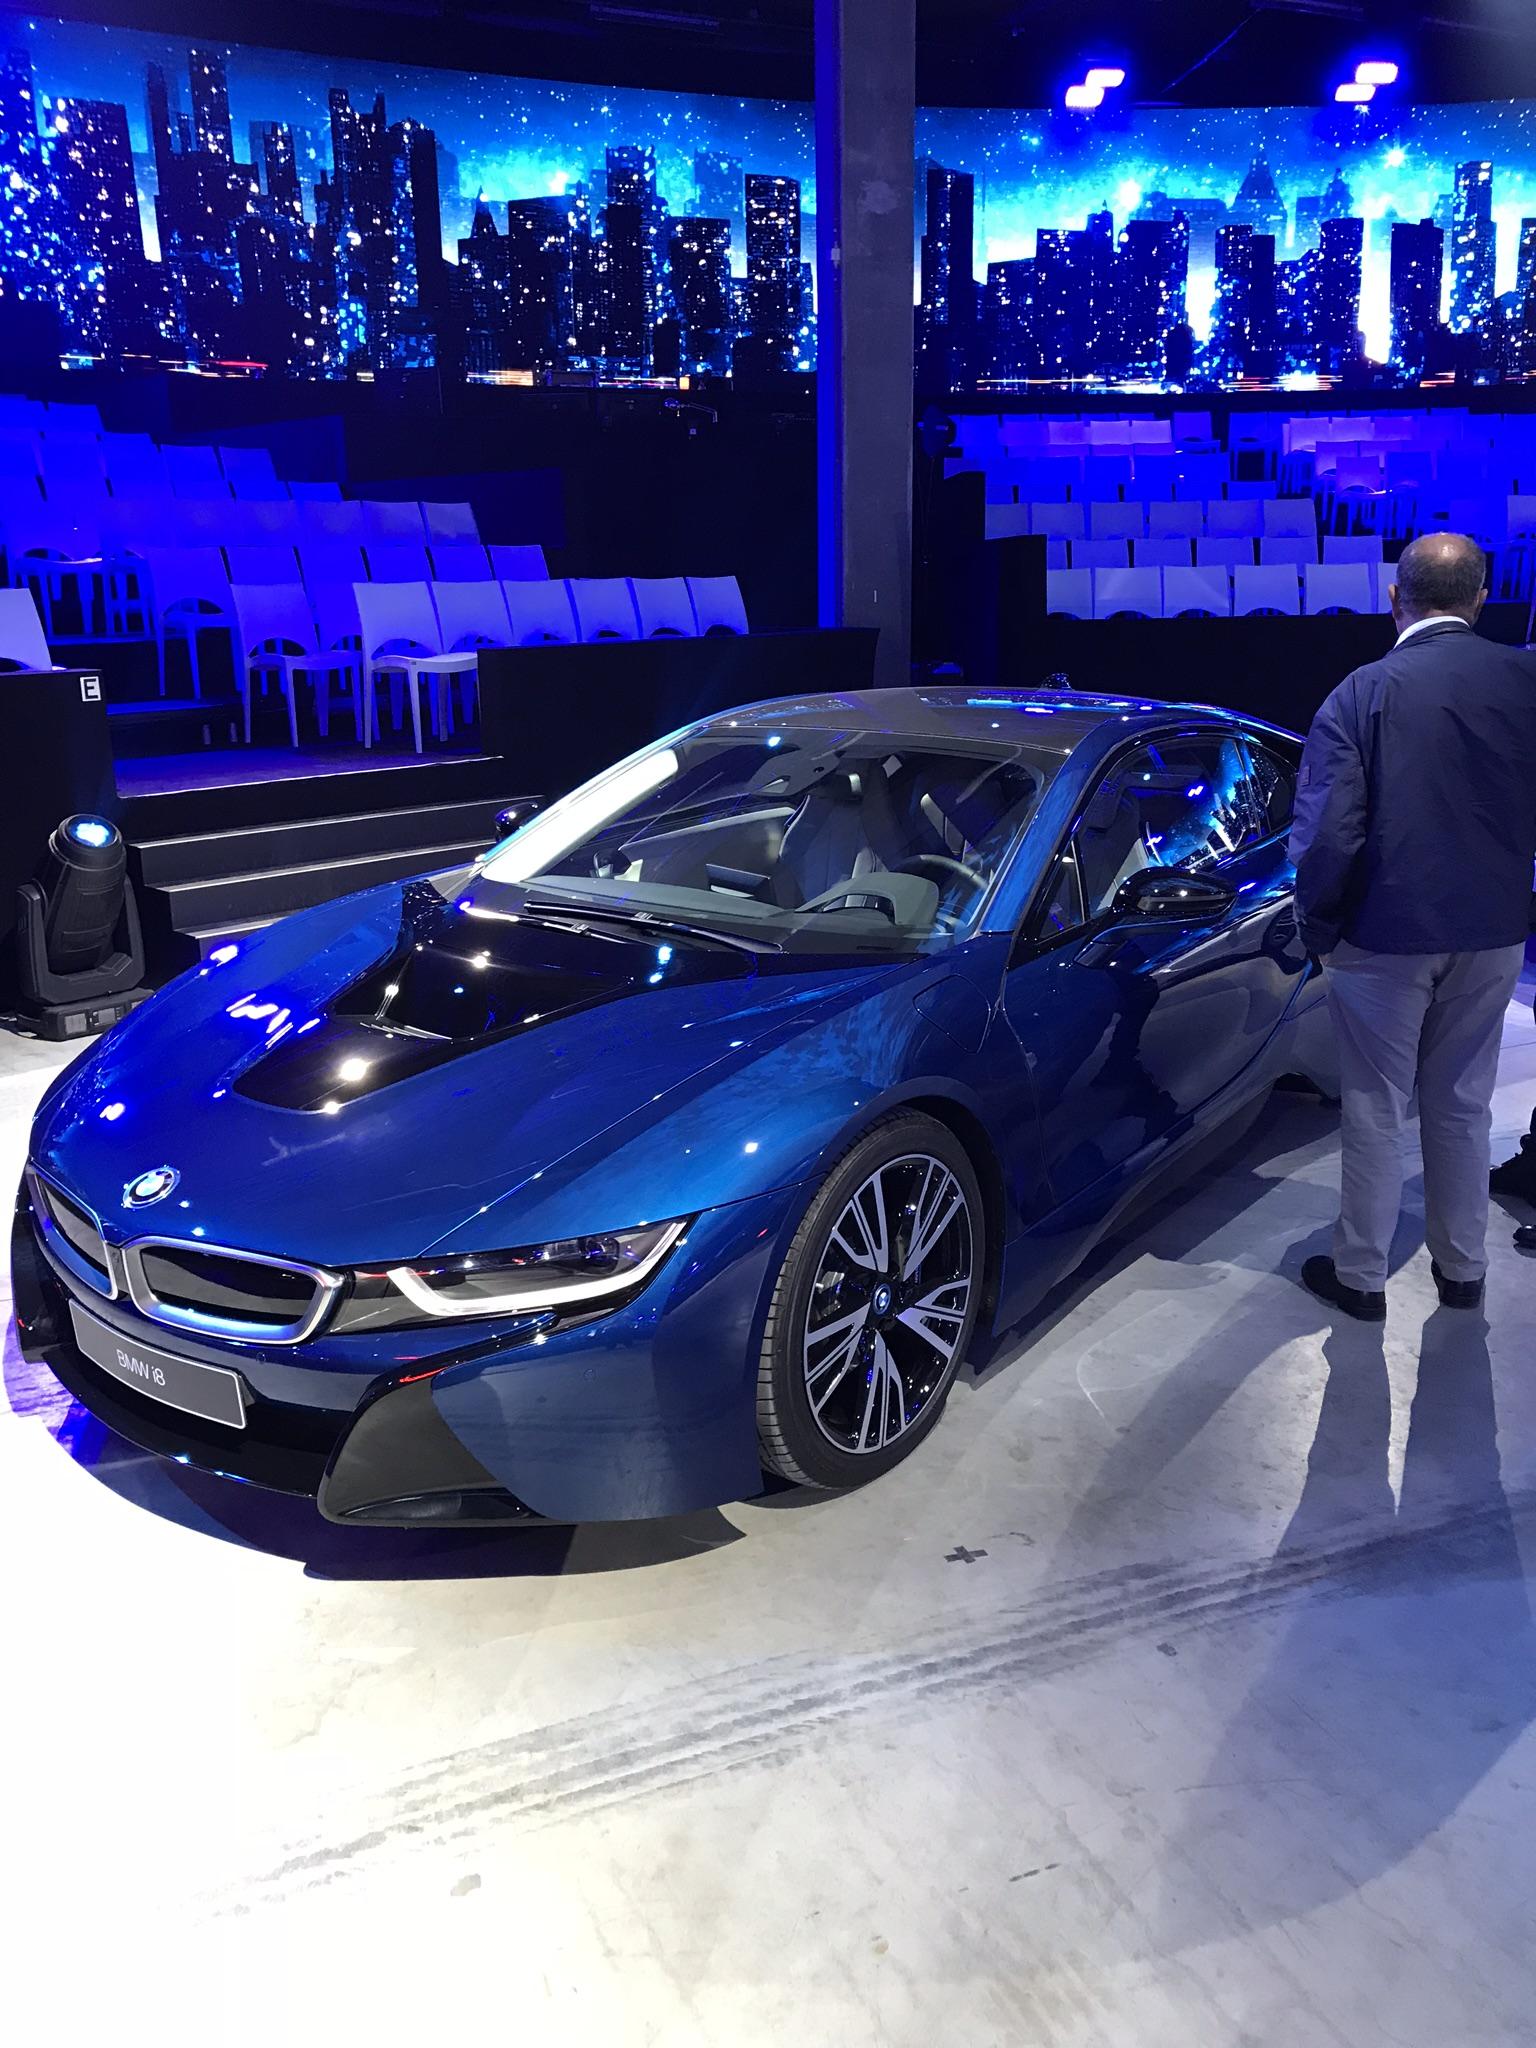 BMW i8 Avus Blue